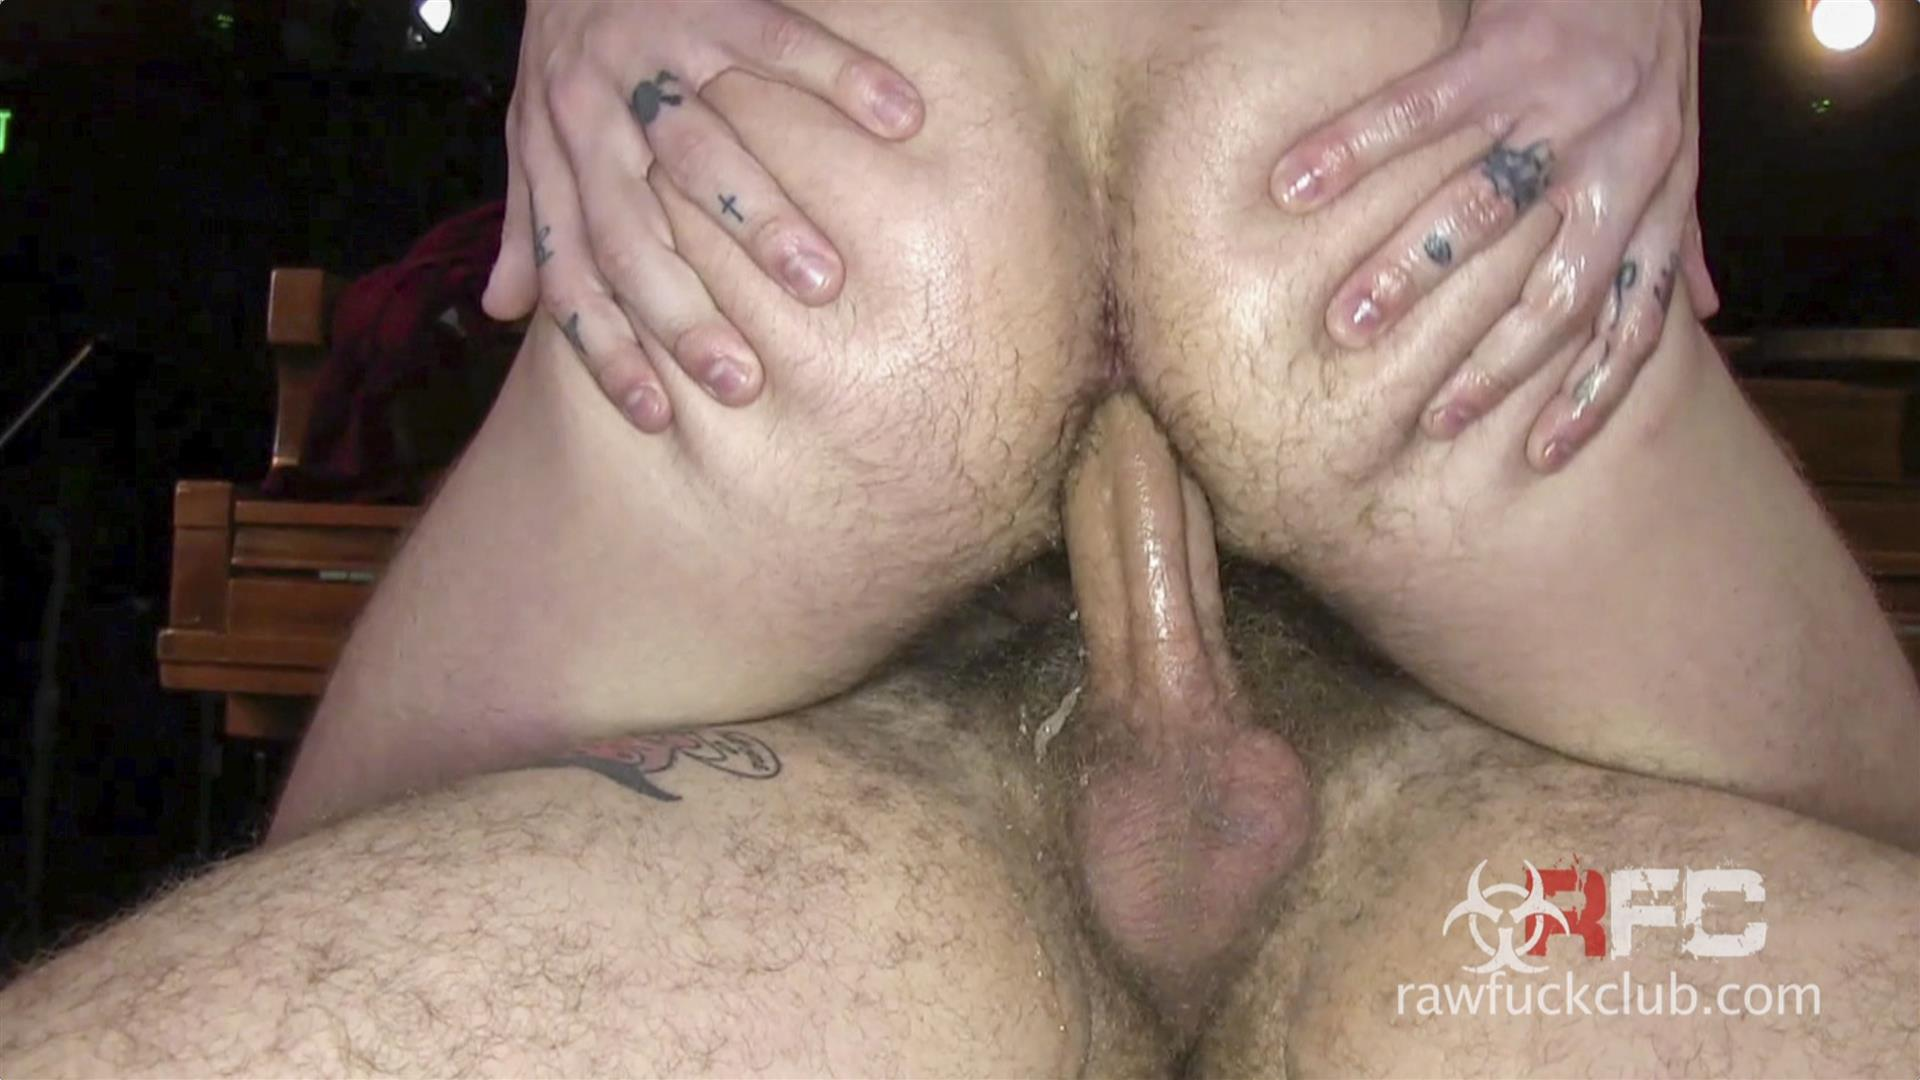 Raw-Fuck-Club-Tristan-Mathews-and-Luke-Harding-Scruffy-Guys-Having-Bareback-Sex-Amateur-Gay-Porn-04 Scruffy Tristan Mathews Gets A Bareback Breeding And Facial